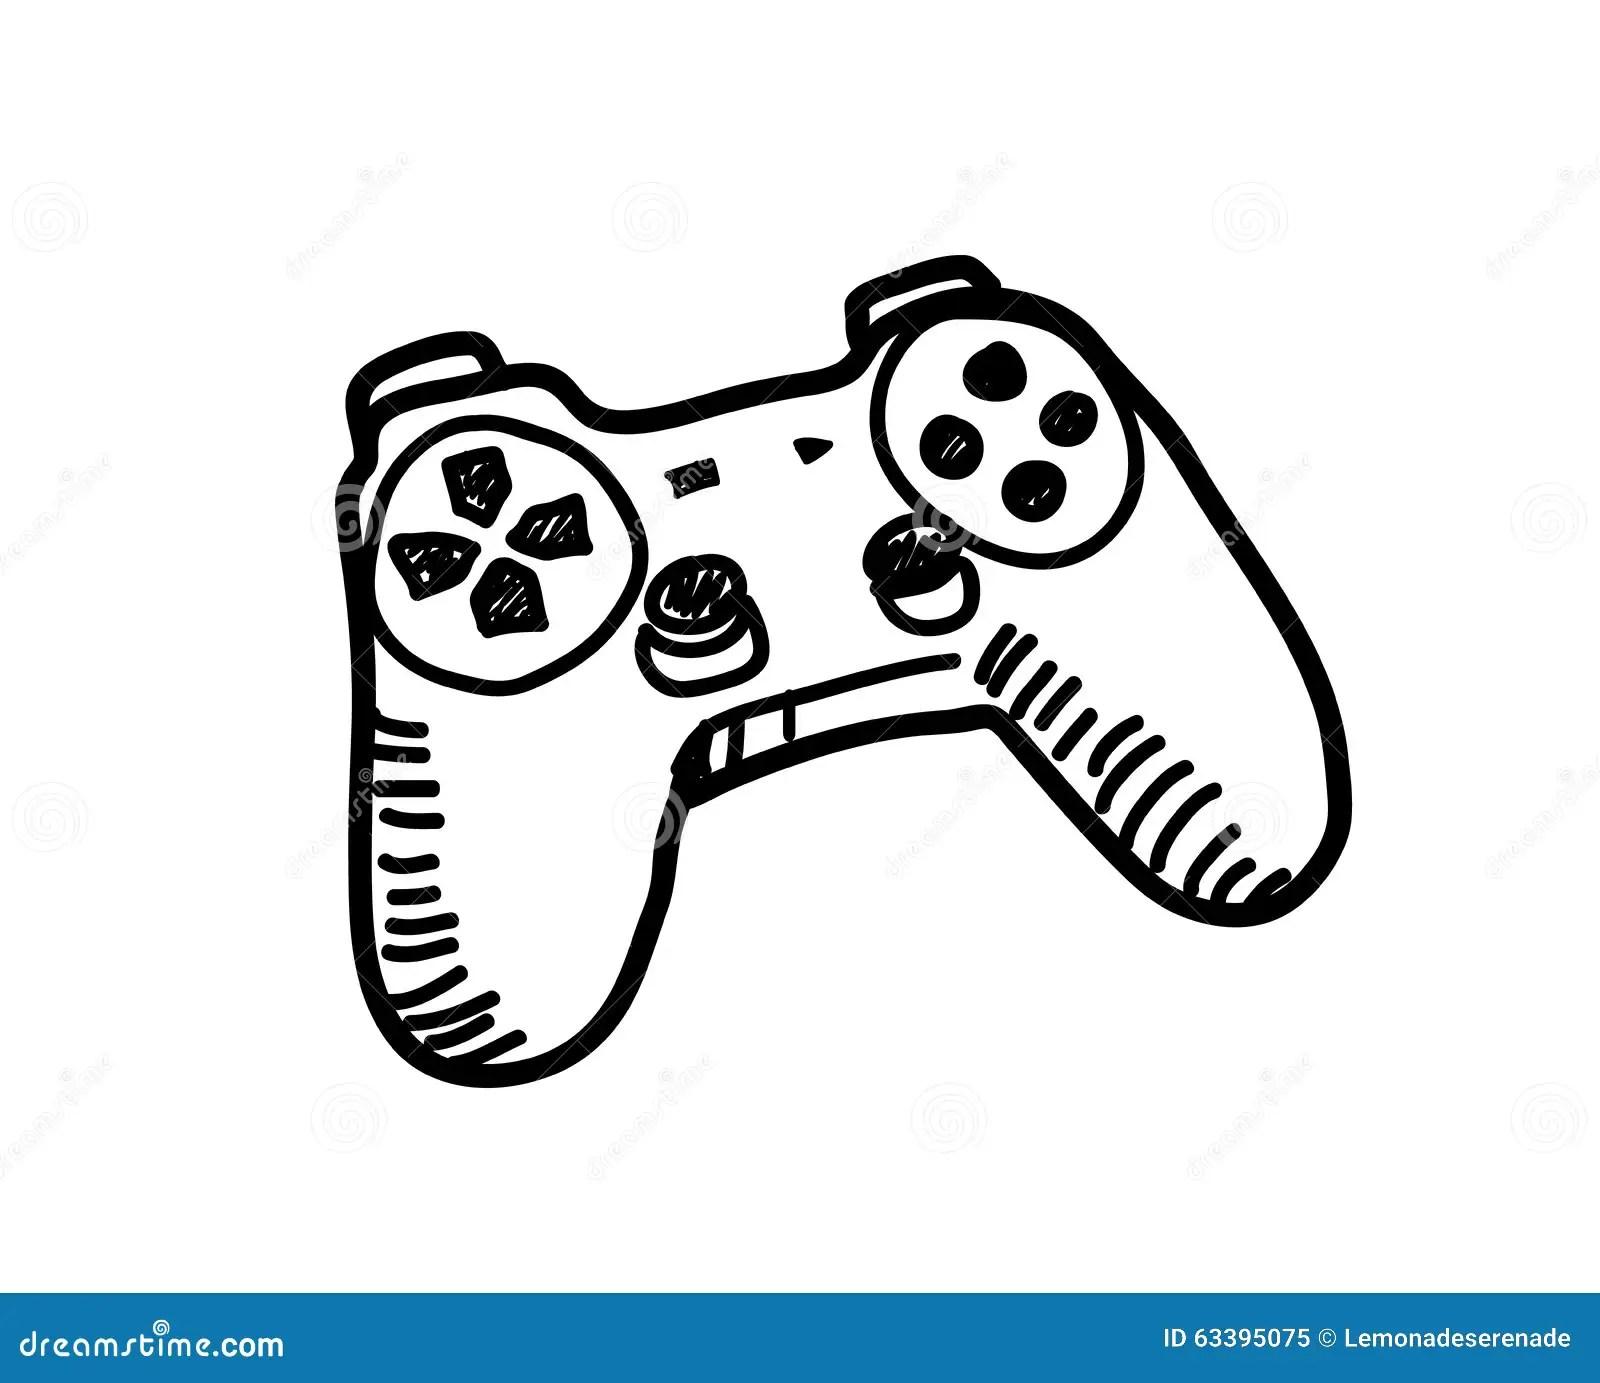 Video Game Controller Doodle Stock Vector